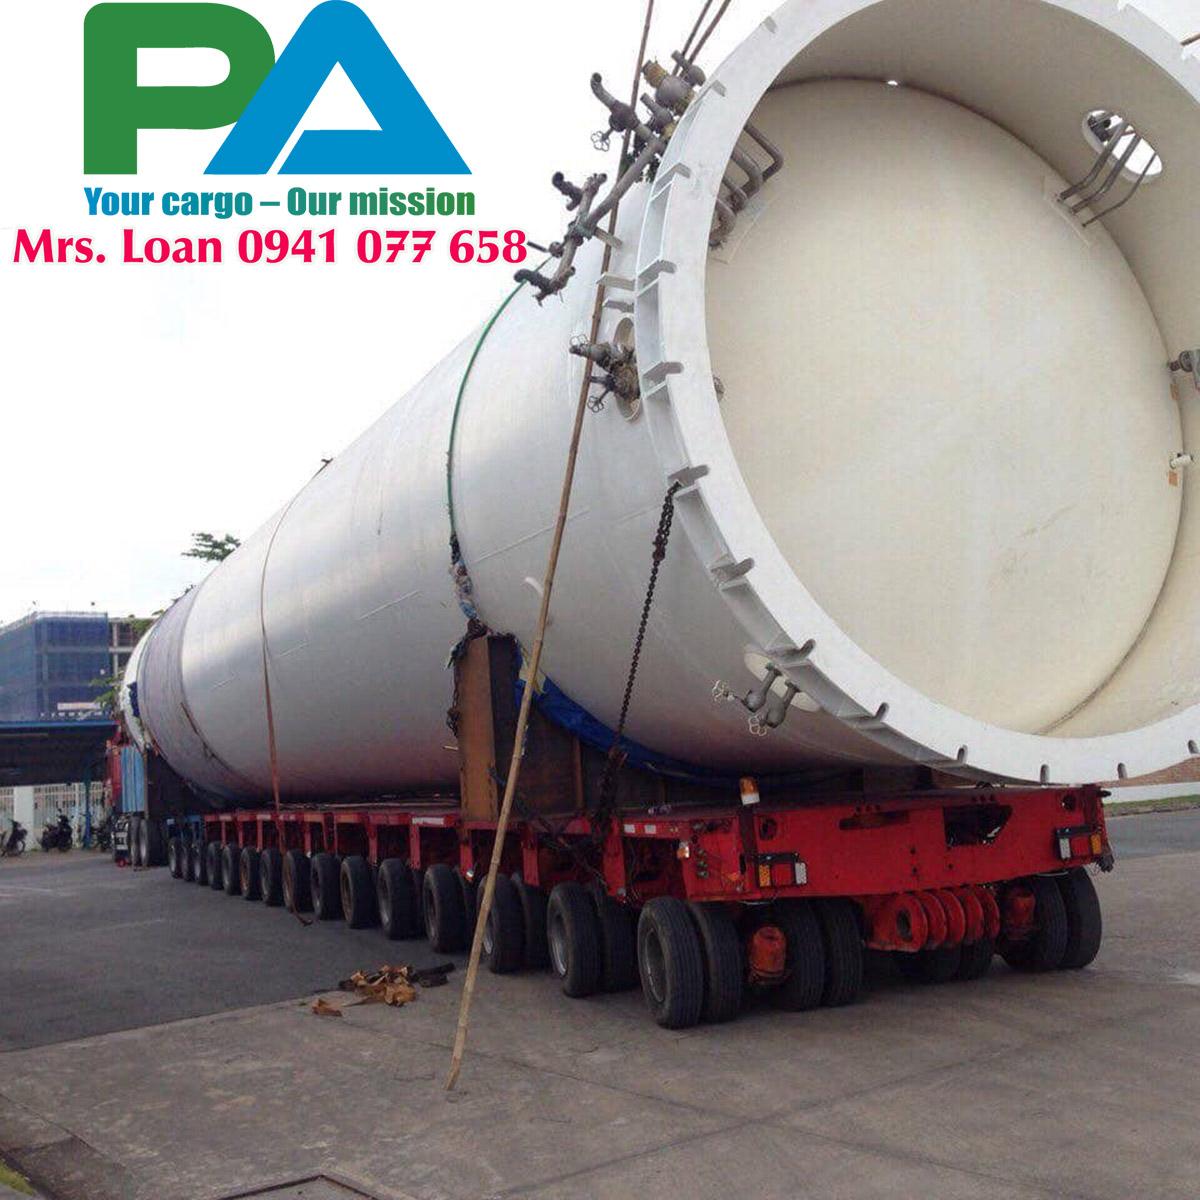 Transport cargo Oversize Overload